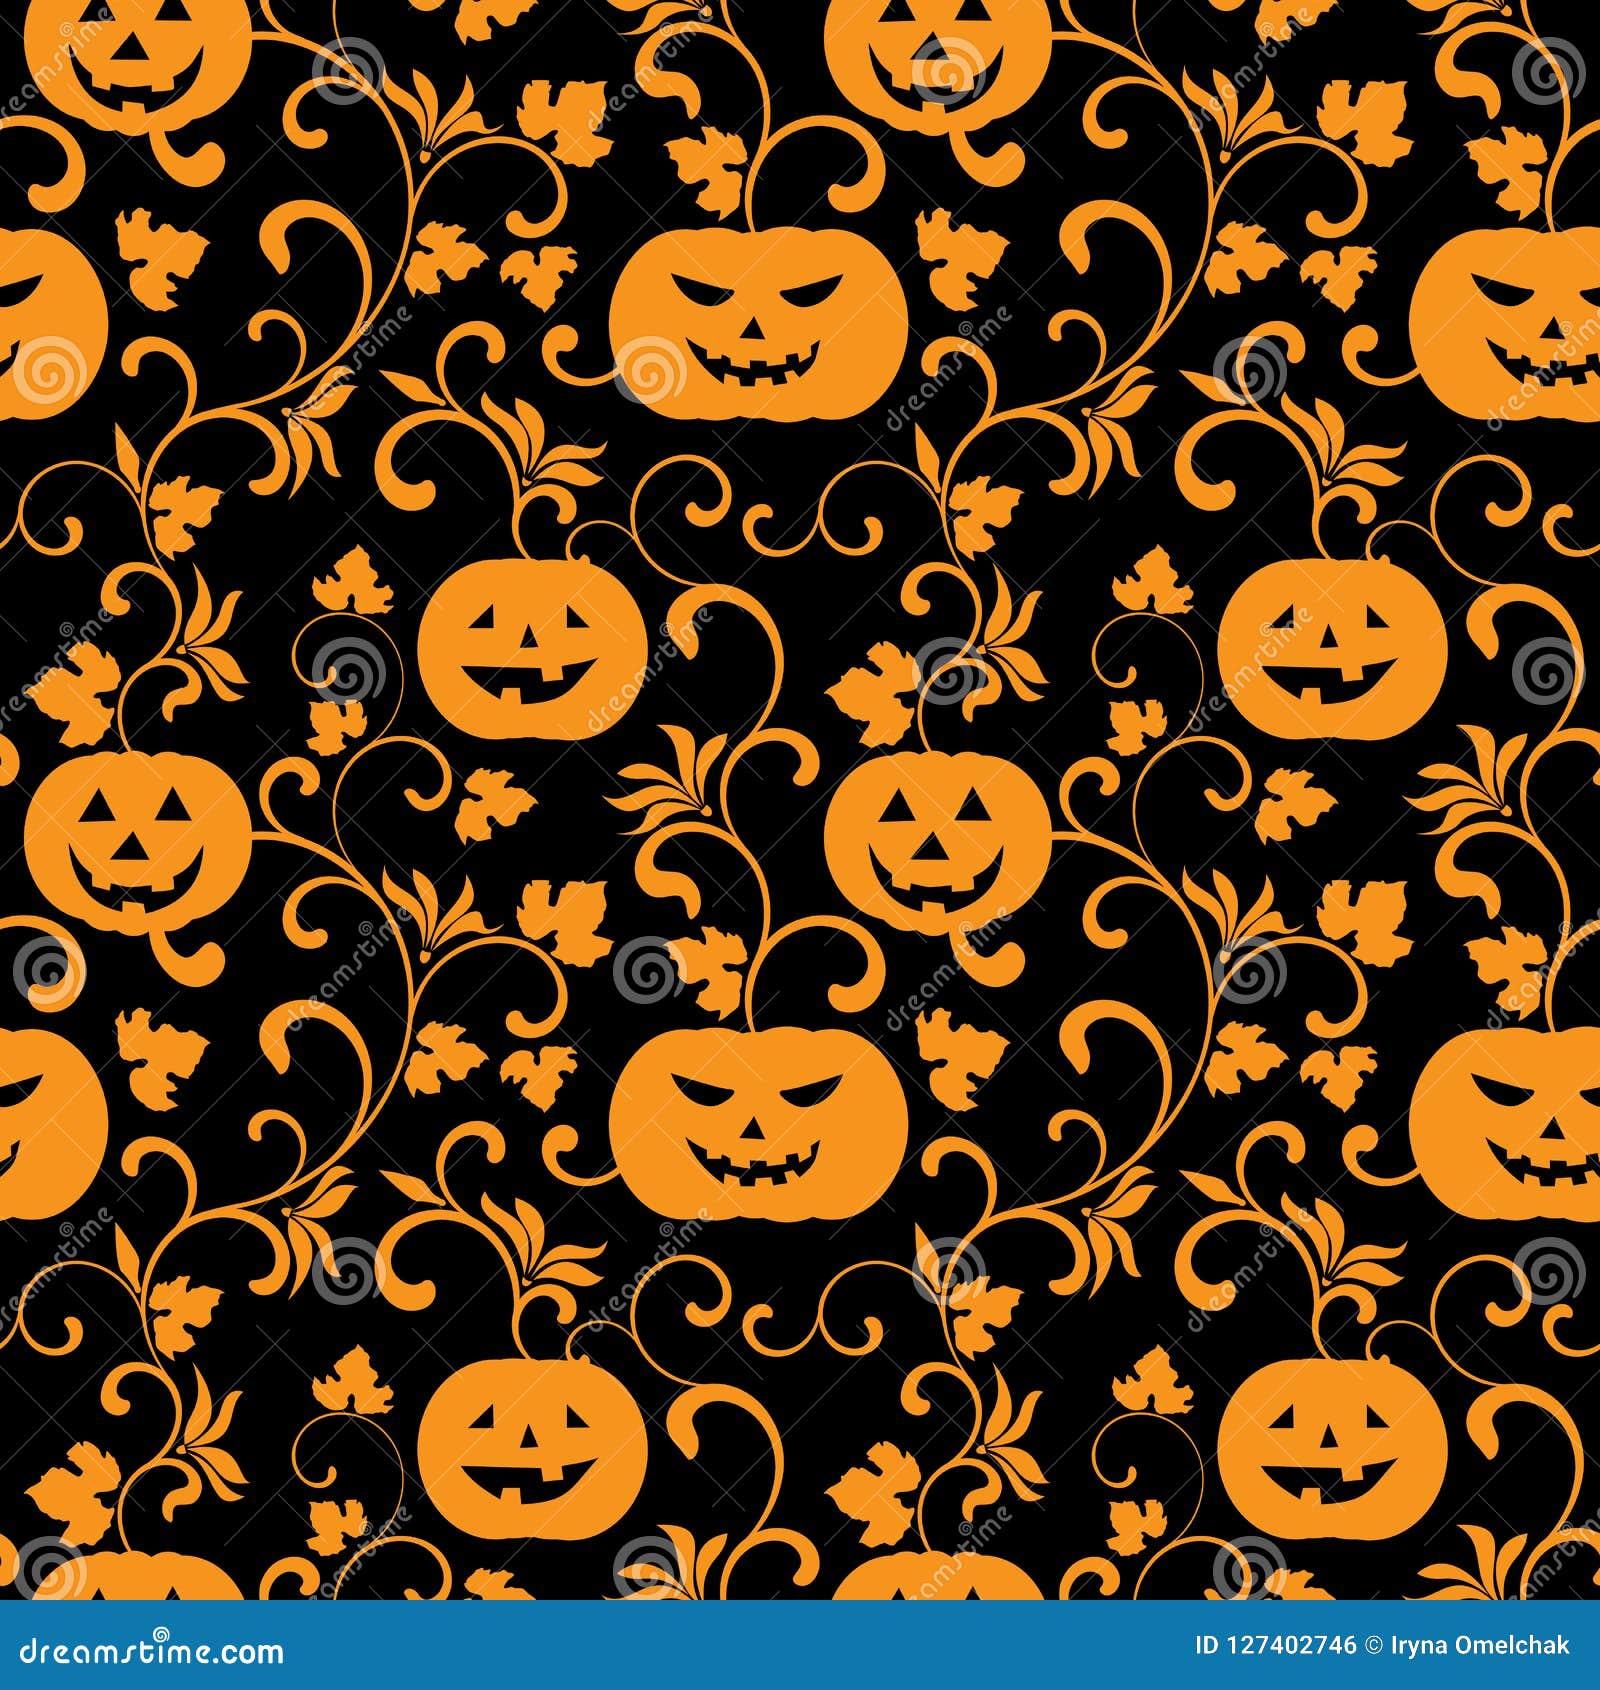 Halloween Pattern Wallpaper.Seamless Halloween Pattern With Pumpkins On A Black Background Stock Vector Illustration Of Orange Dark 127402746